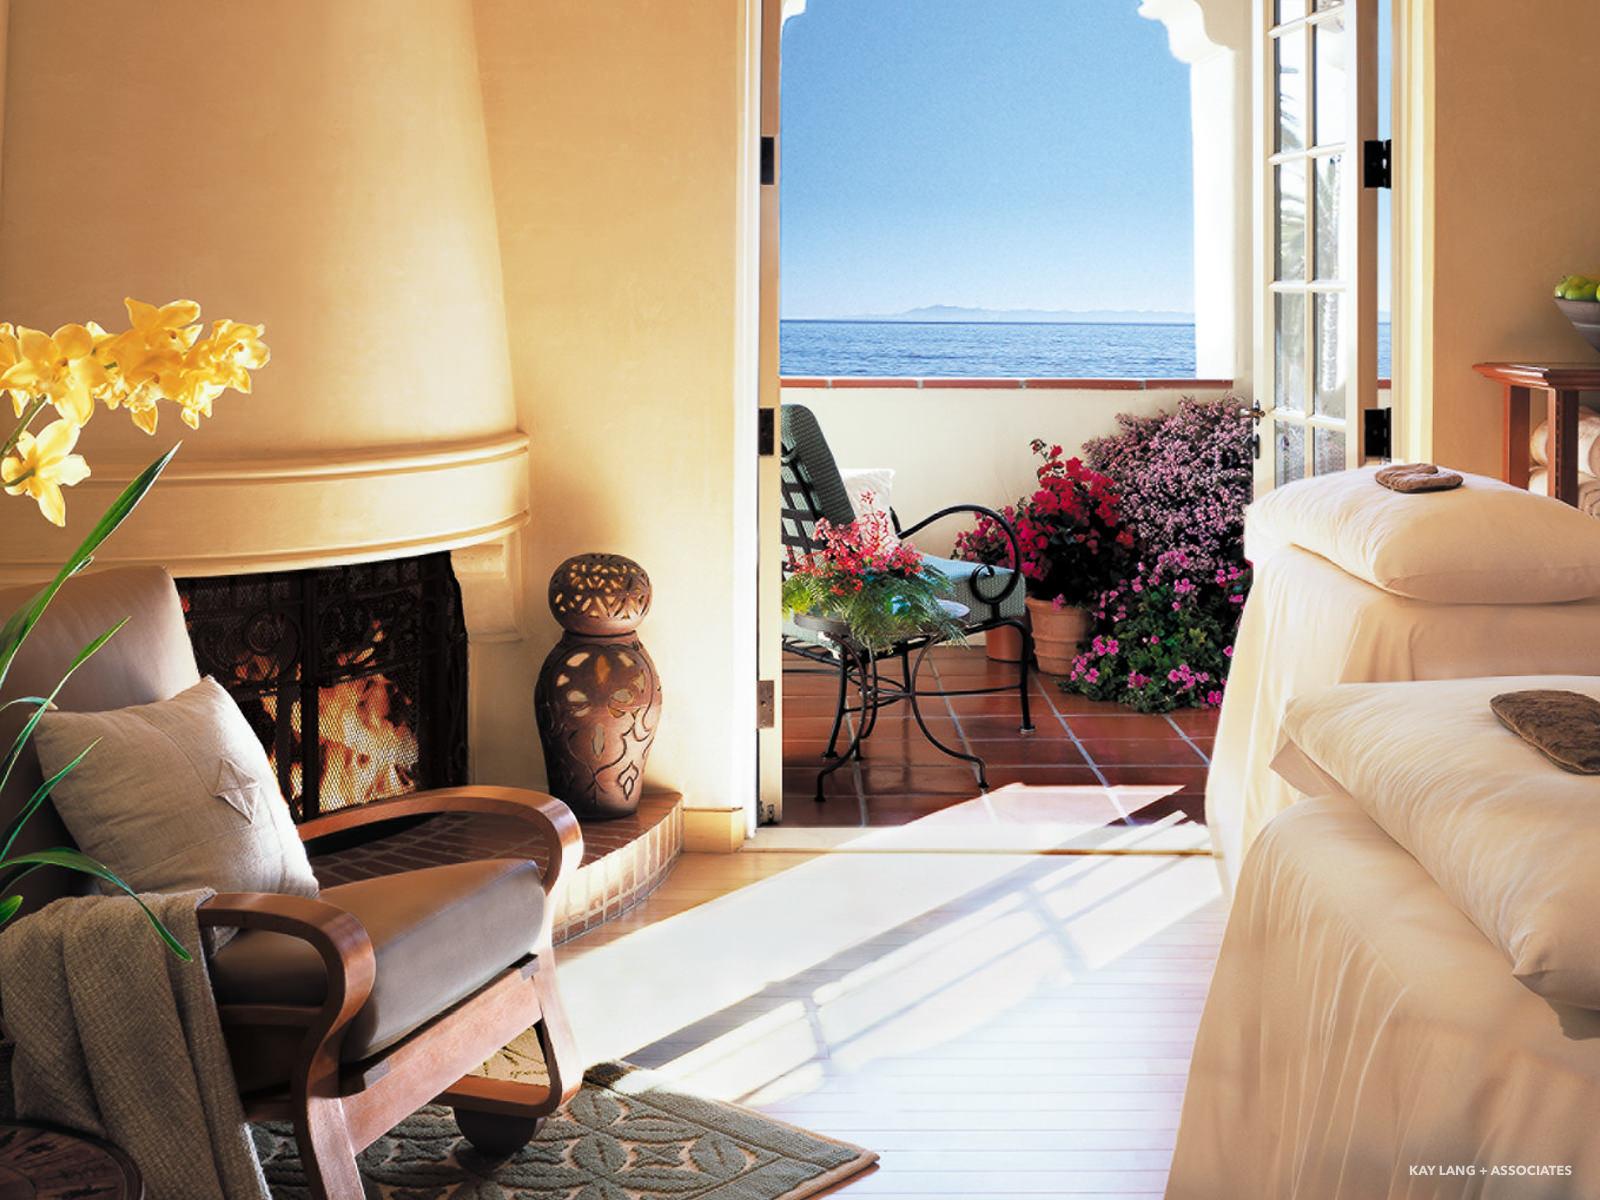 Kay Lang Associates Interior Design Firm Los Angeles California